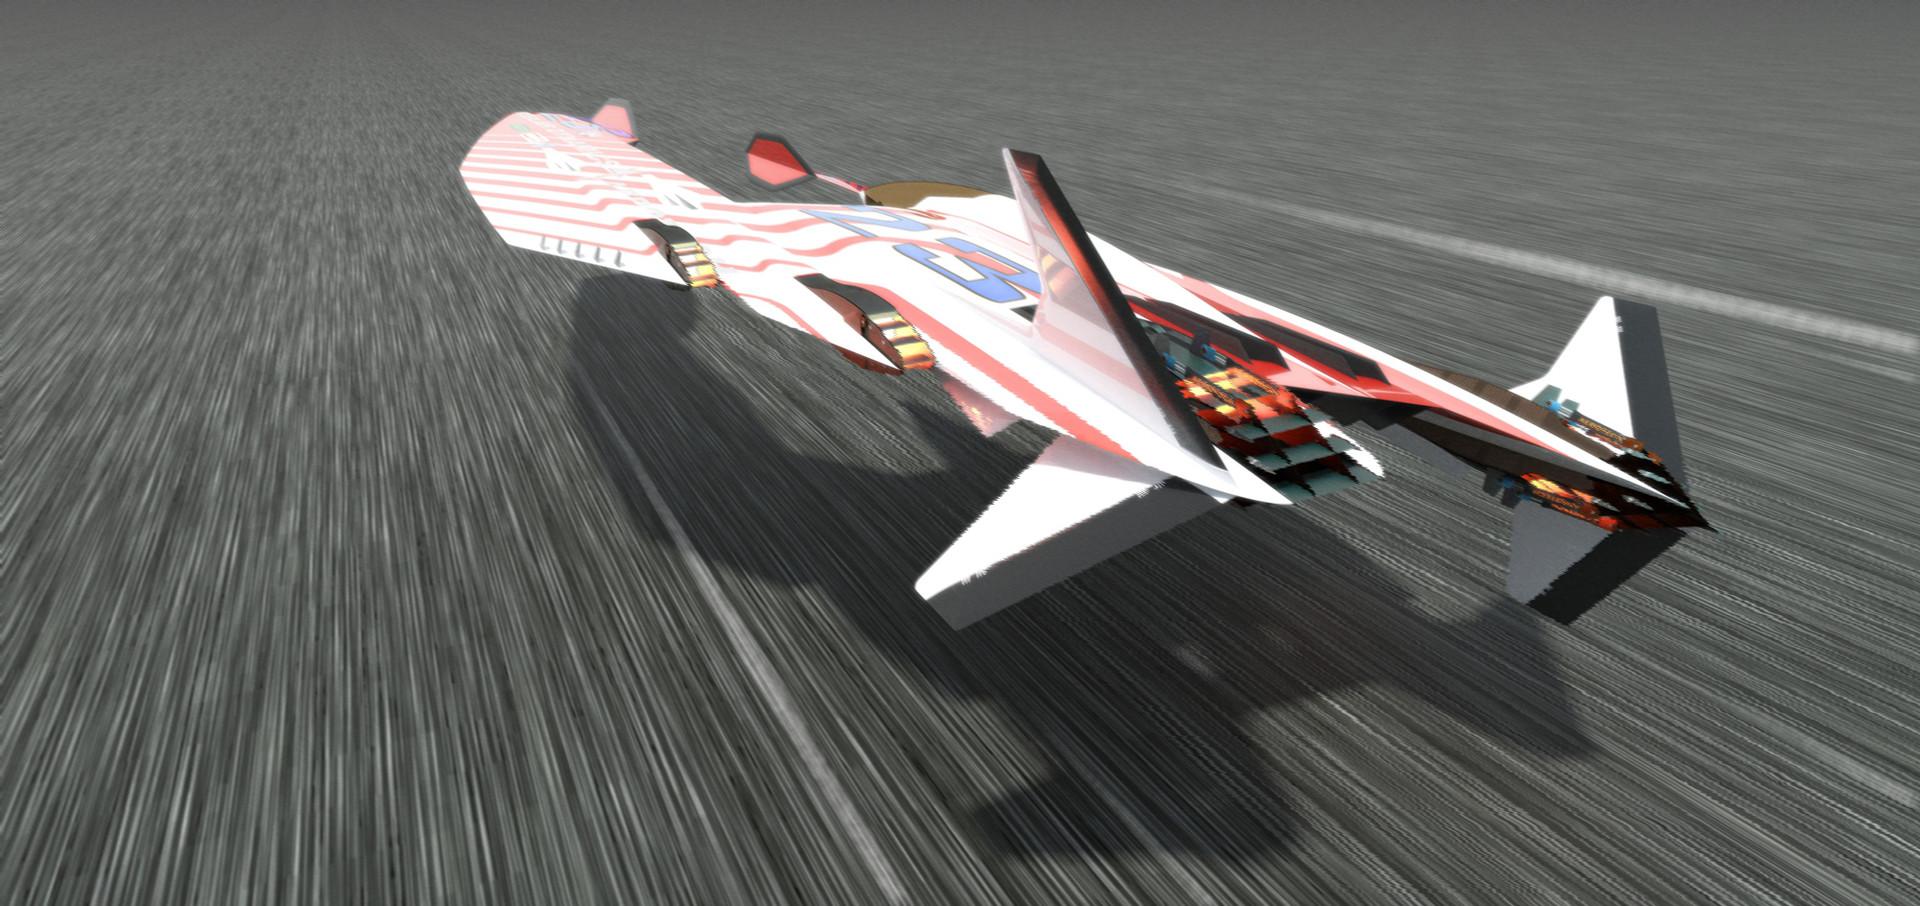 Joachim sverd martian aeroracer25speed